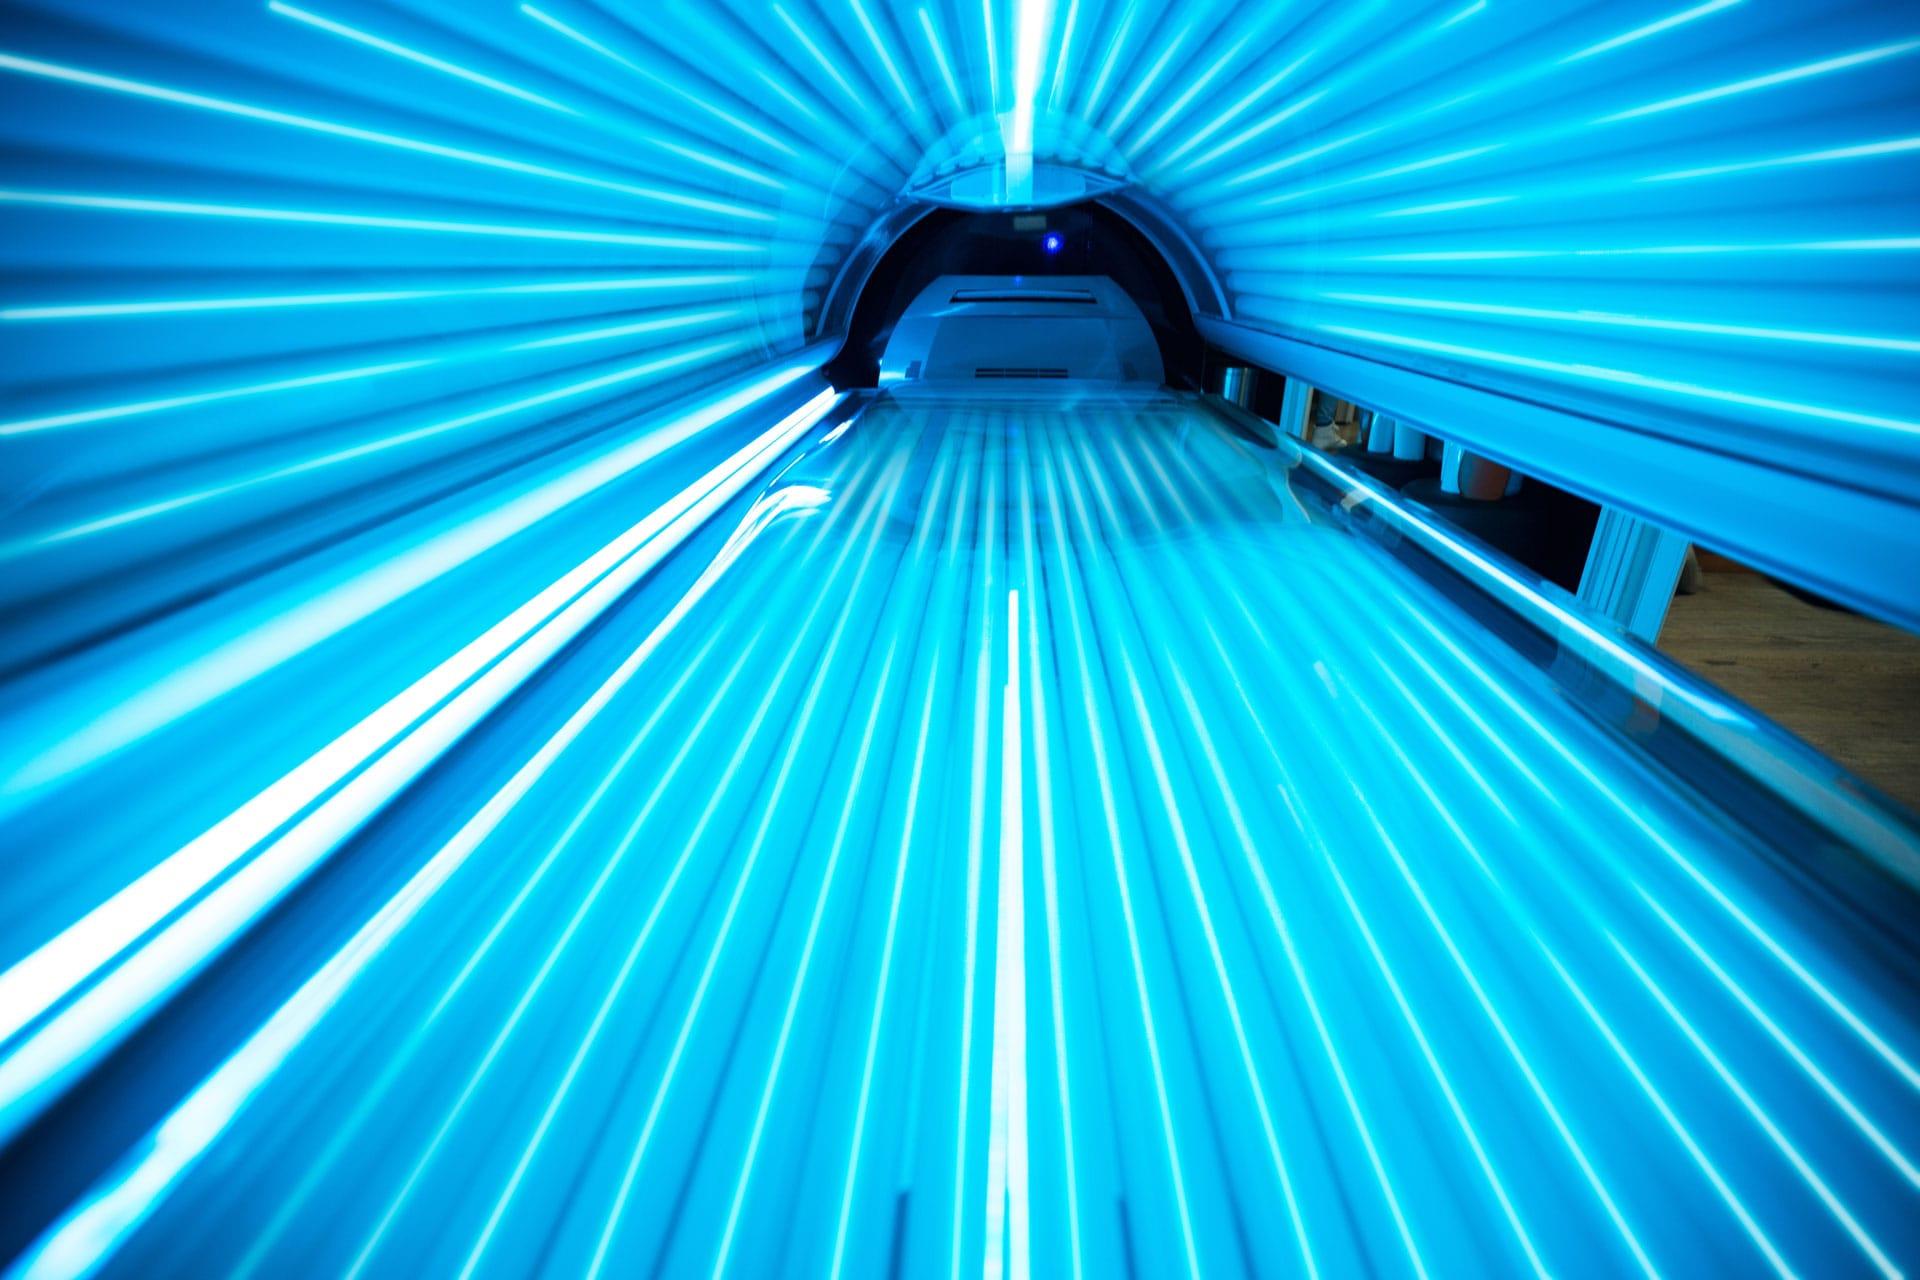 Suntan-zonnestudio-Zonnecosmetica-AdobeStock_93863244